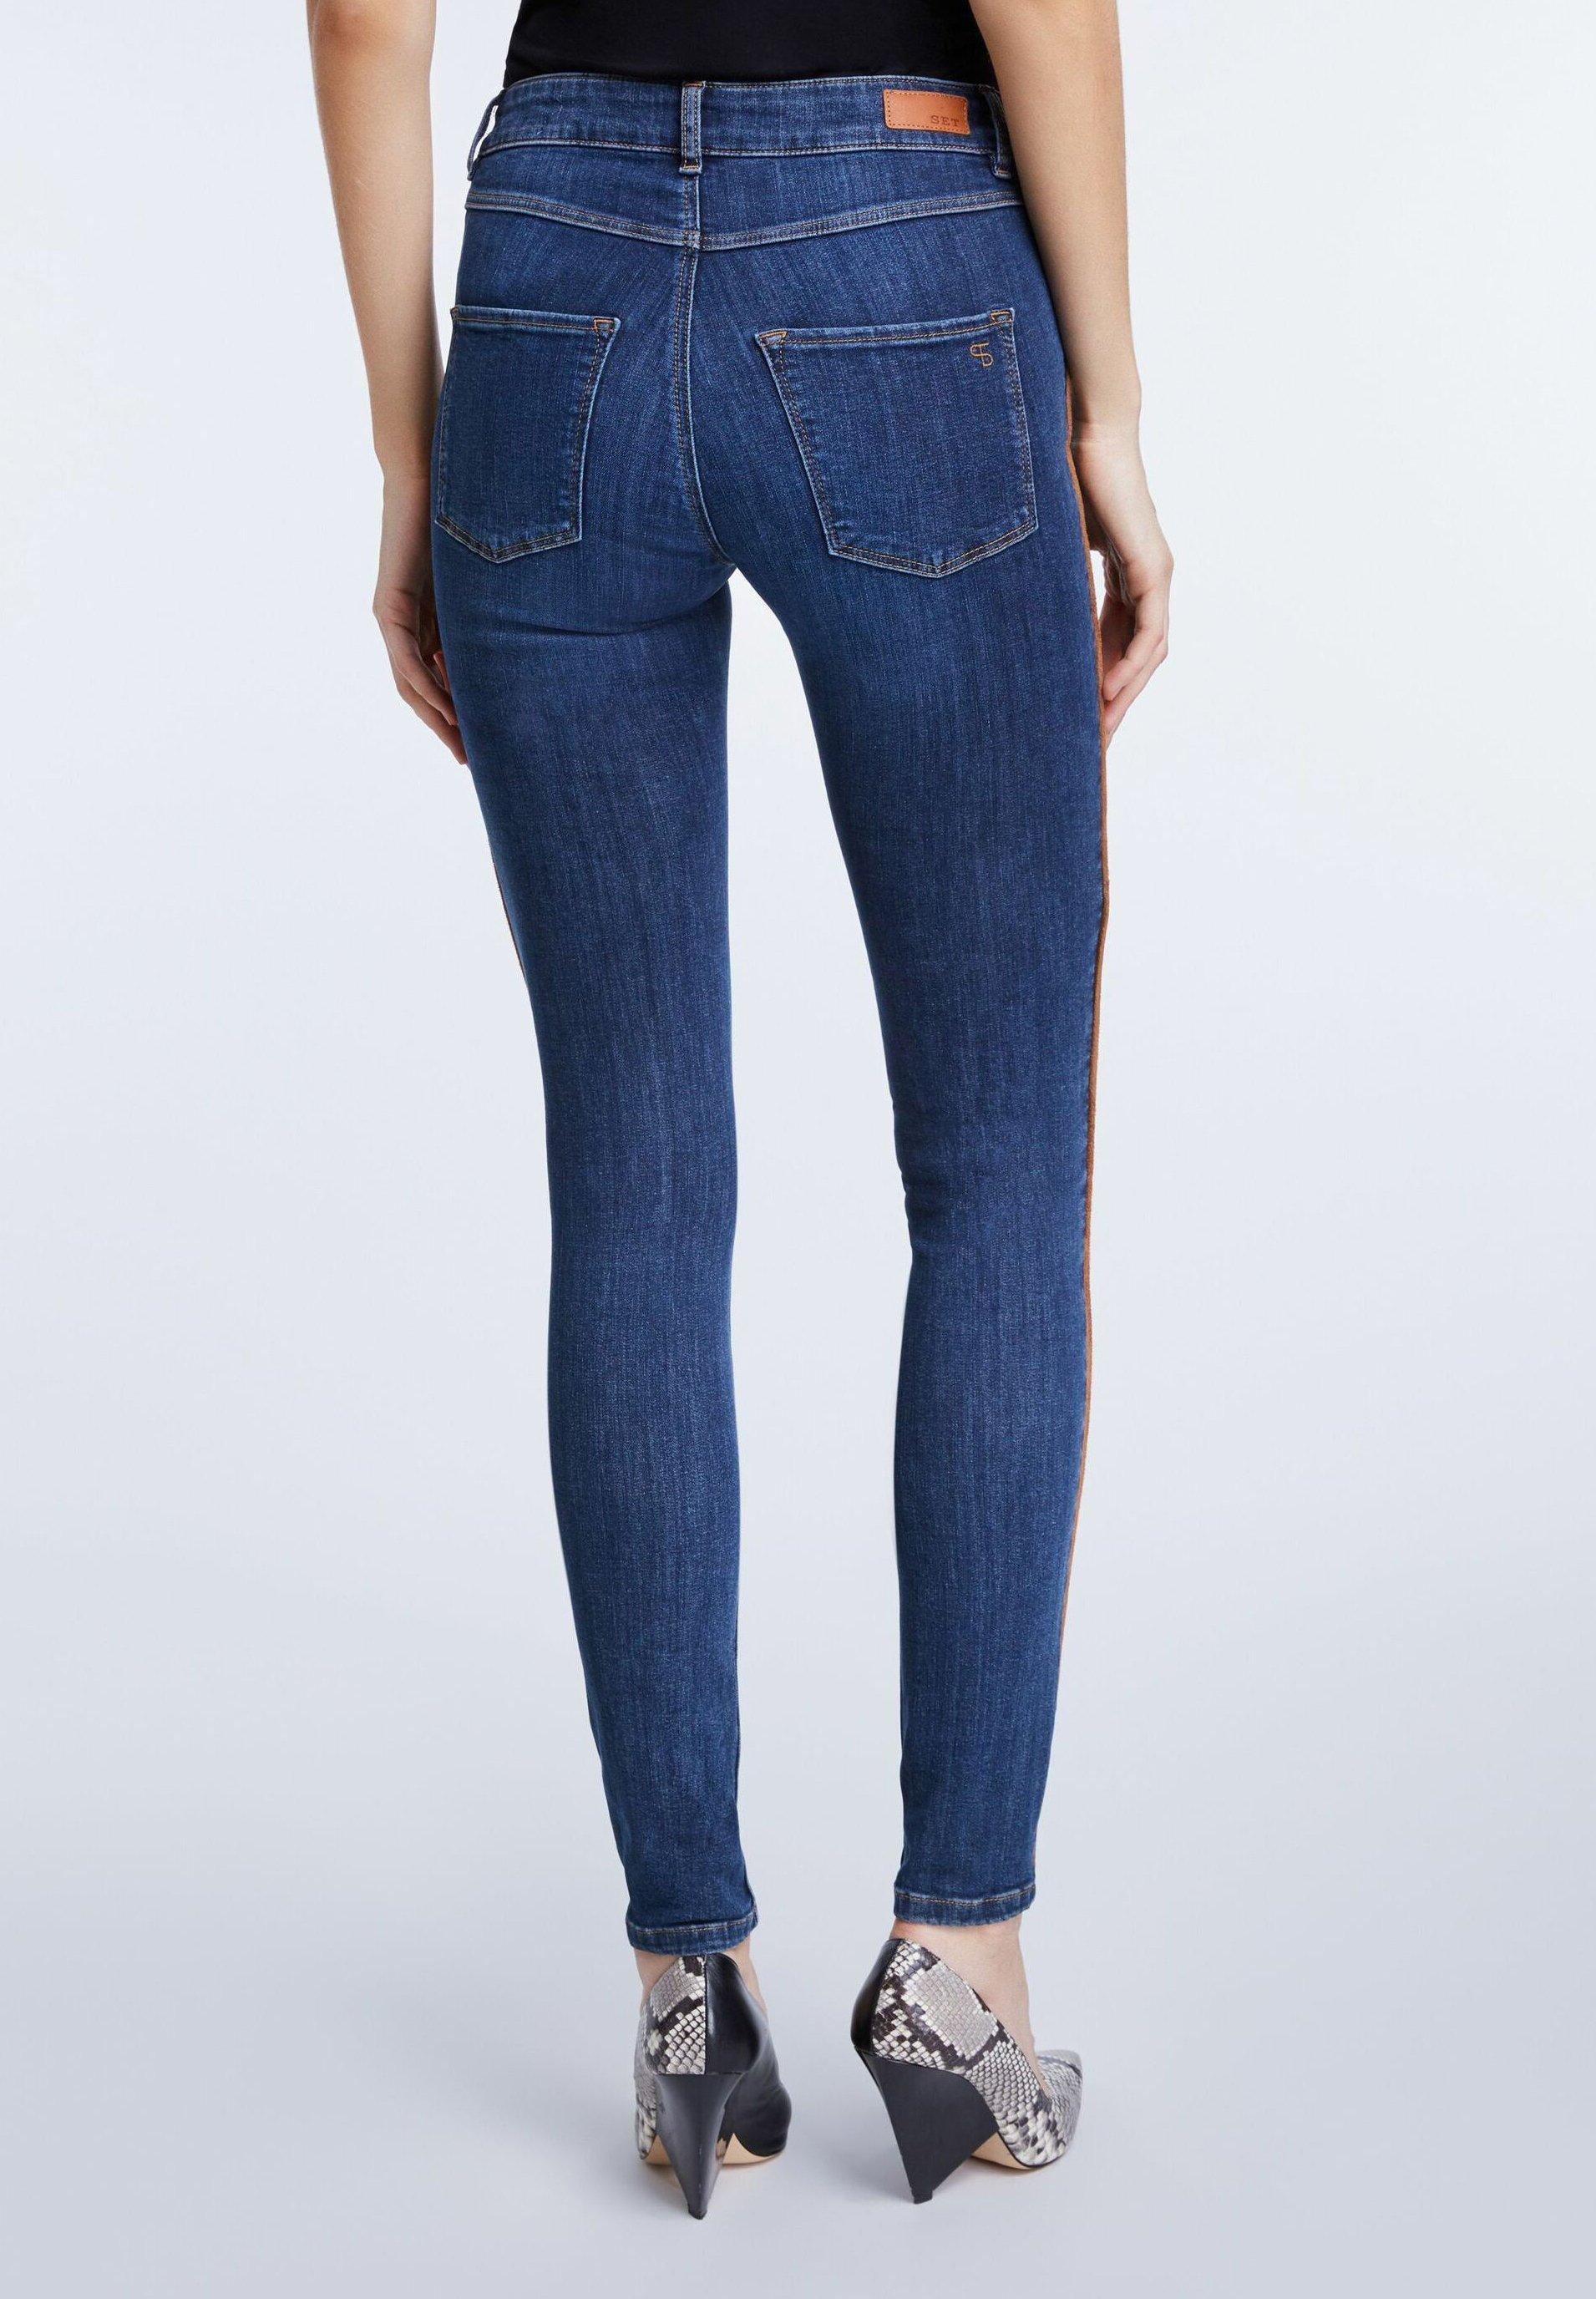 SET Jeans Skinny - bright blue - Jeans Femme xyJjD